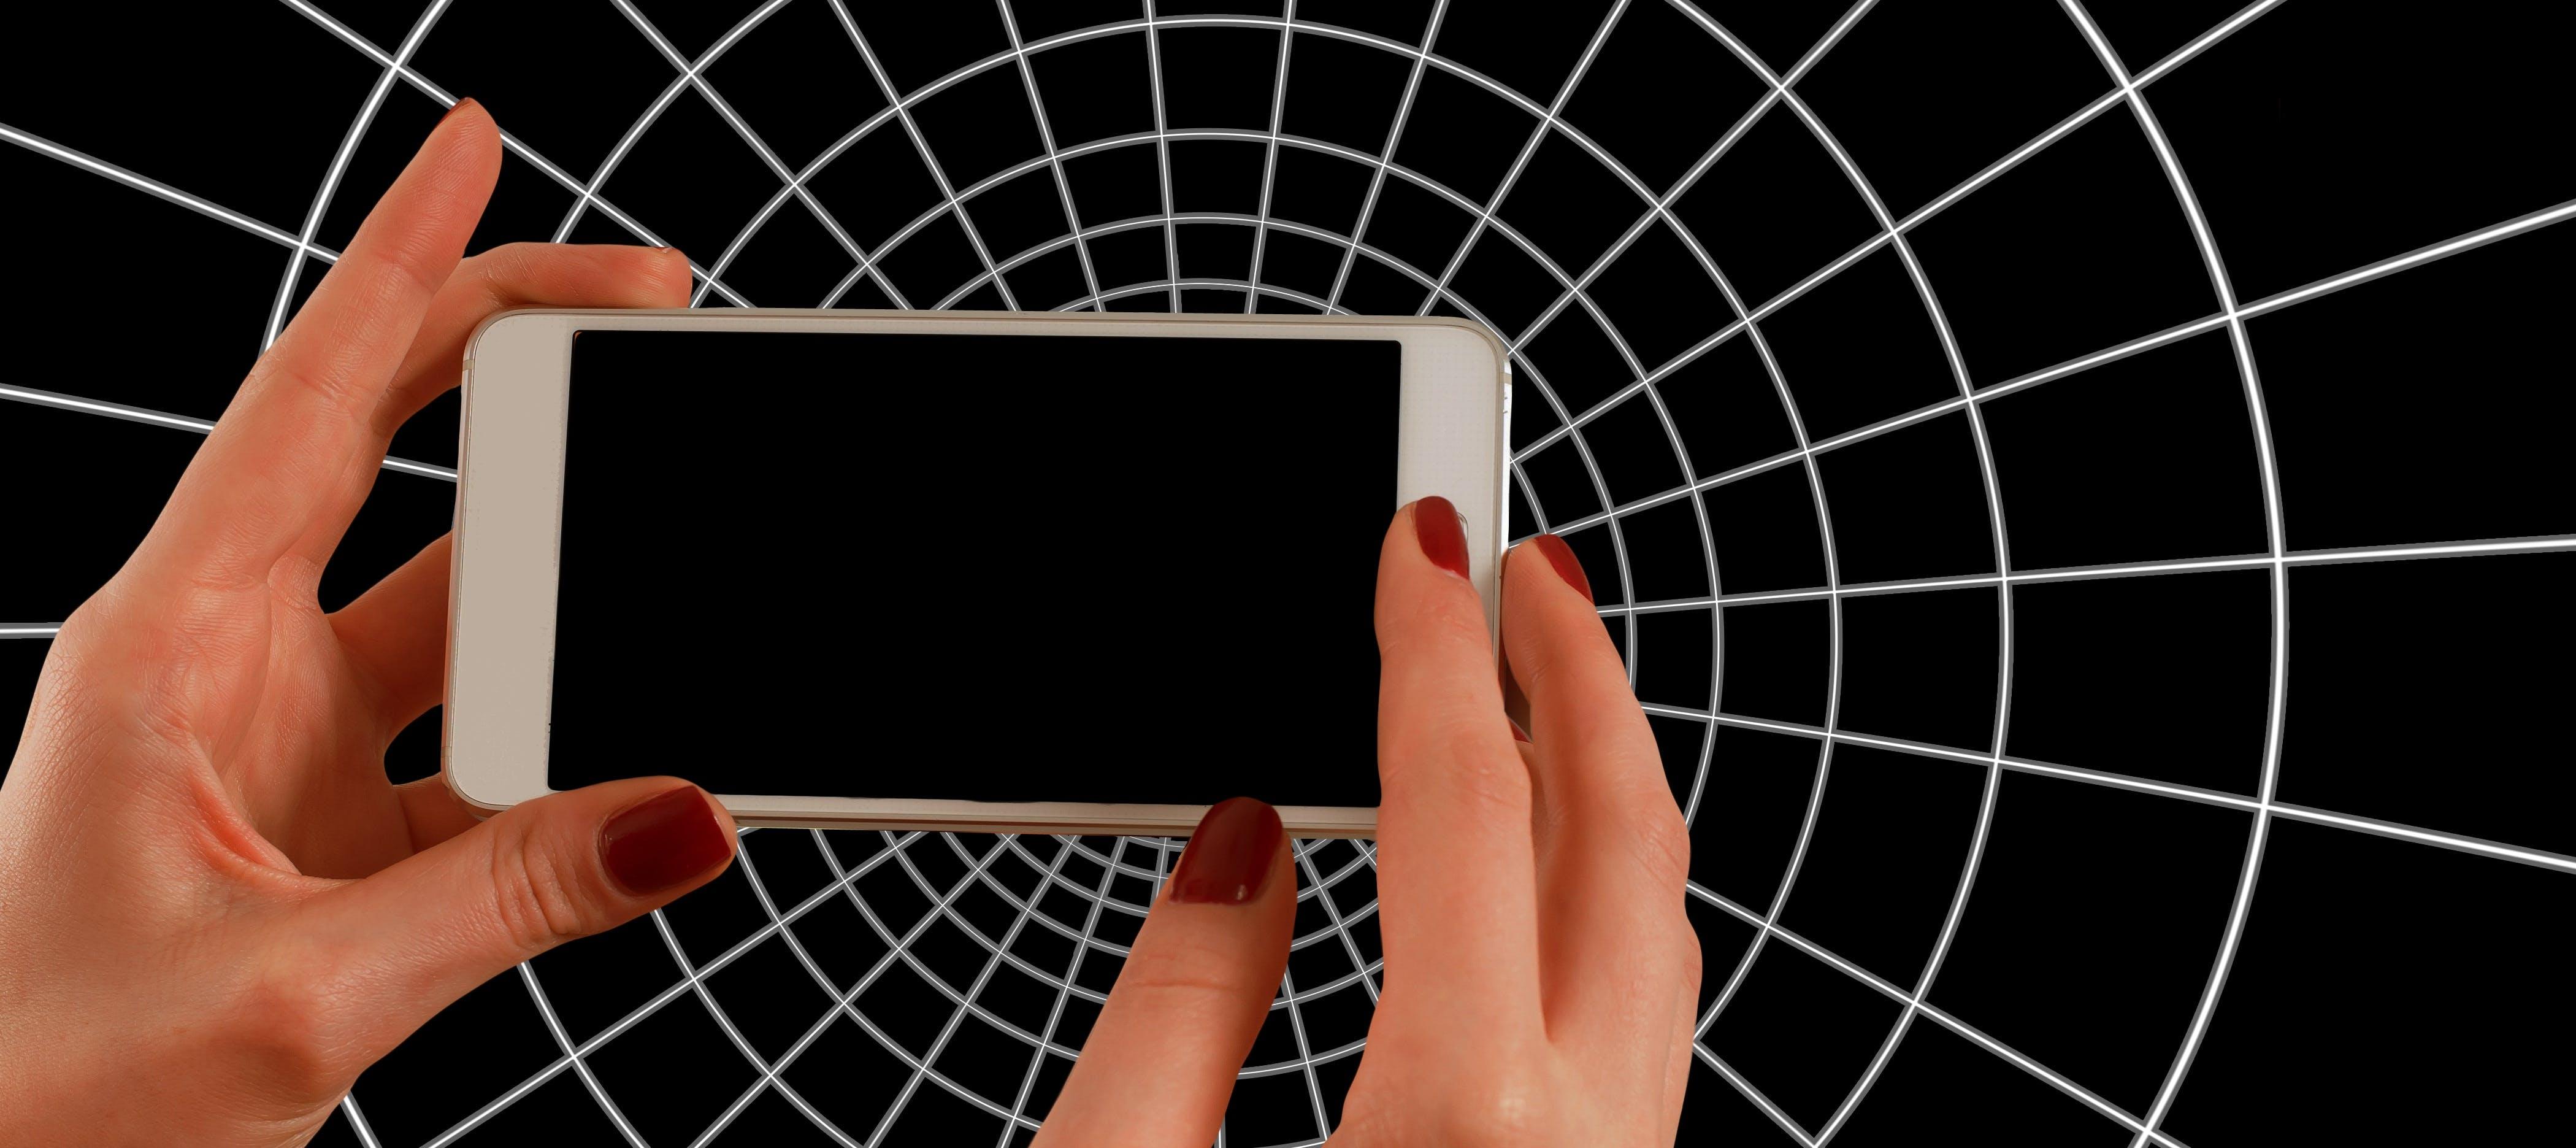 Безкоштовне стокове фото на тему «веб, дотик, екран, електроніка»